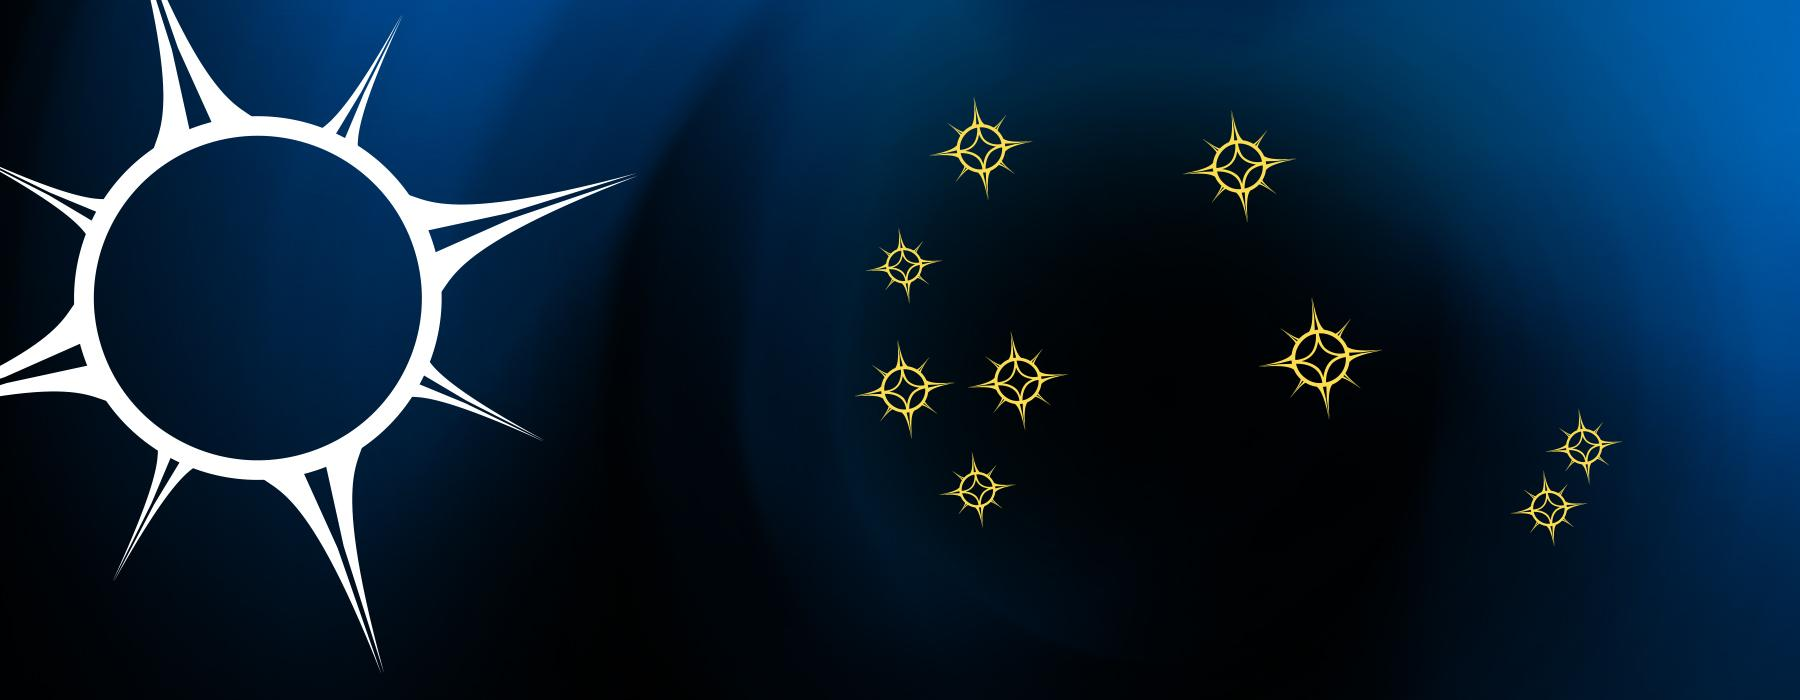 Illustration of the Matariki star cluster